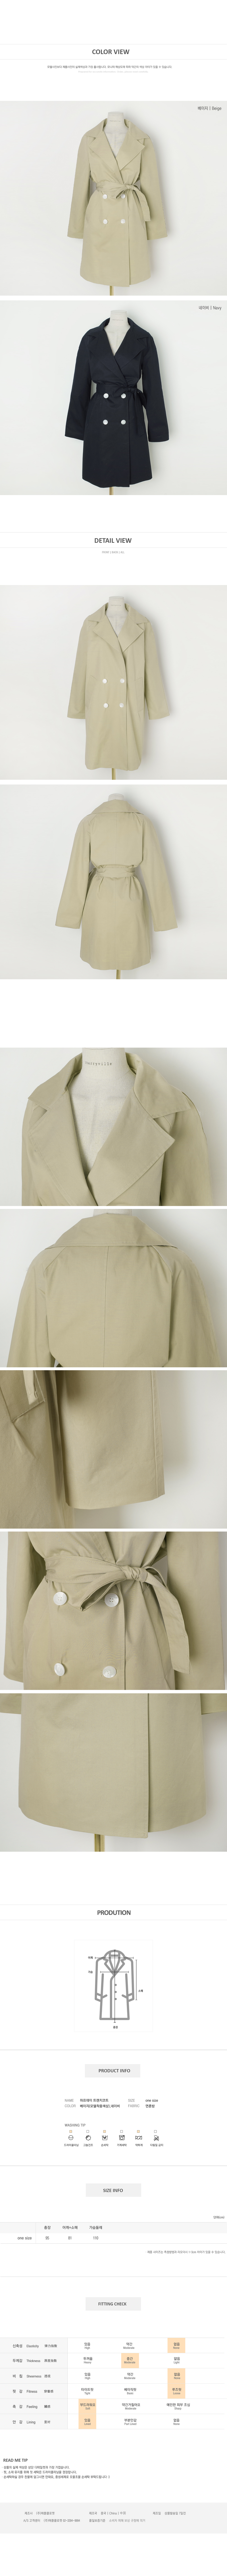 Half day trench coat